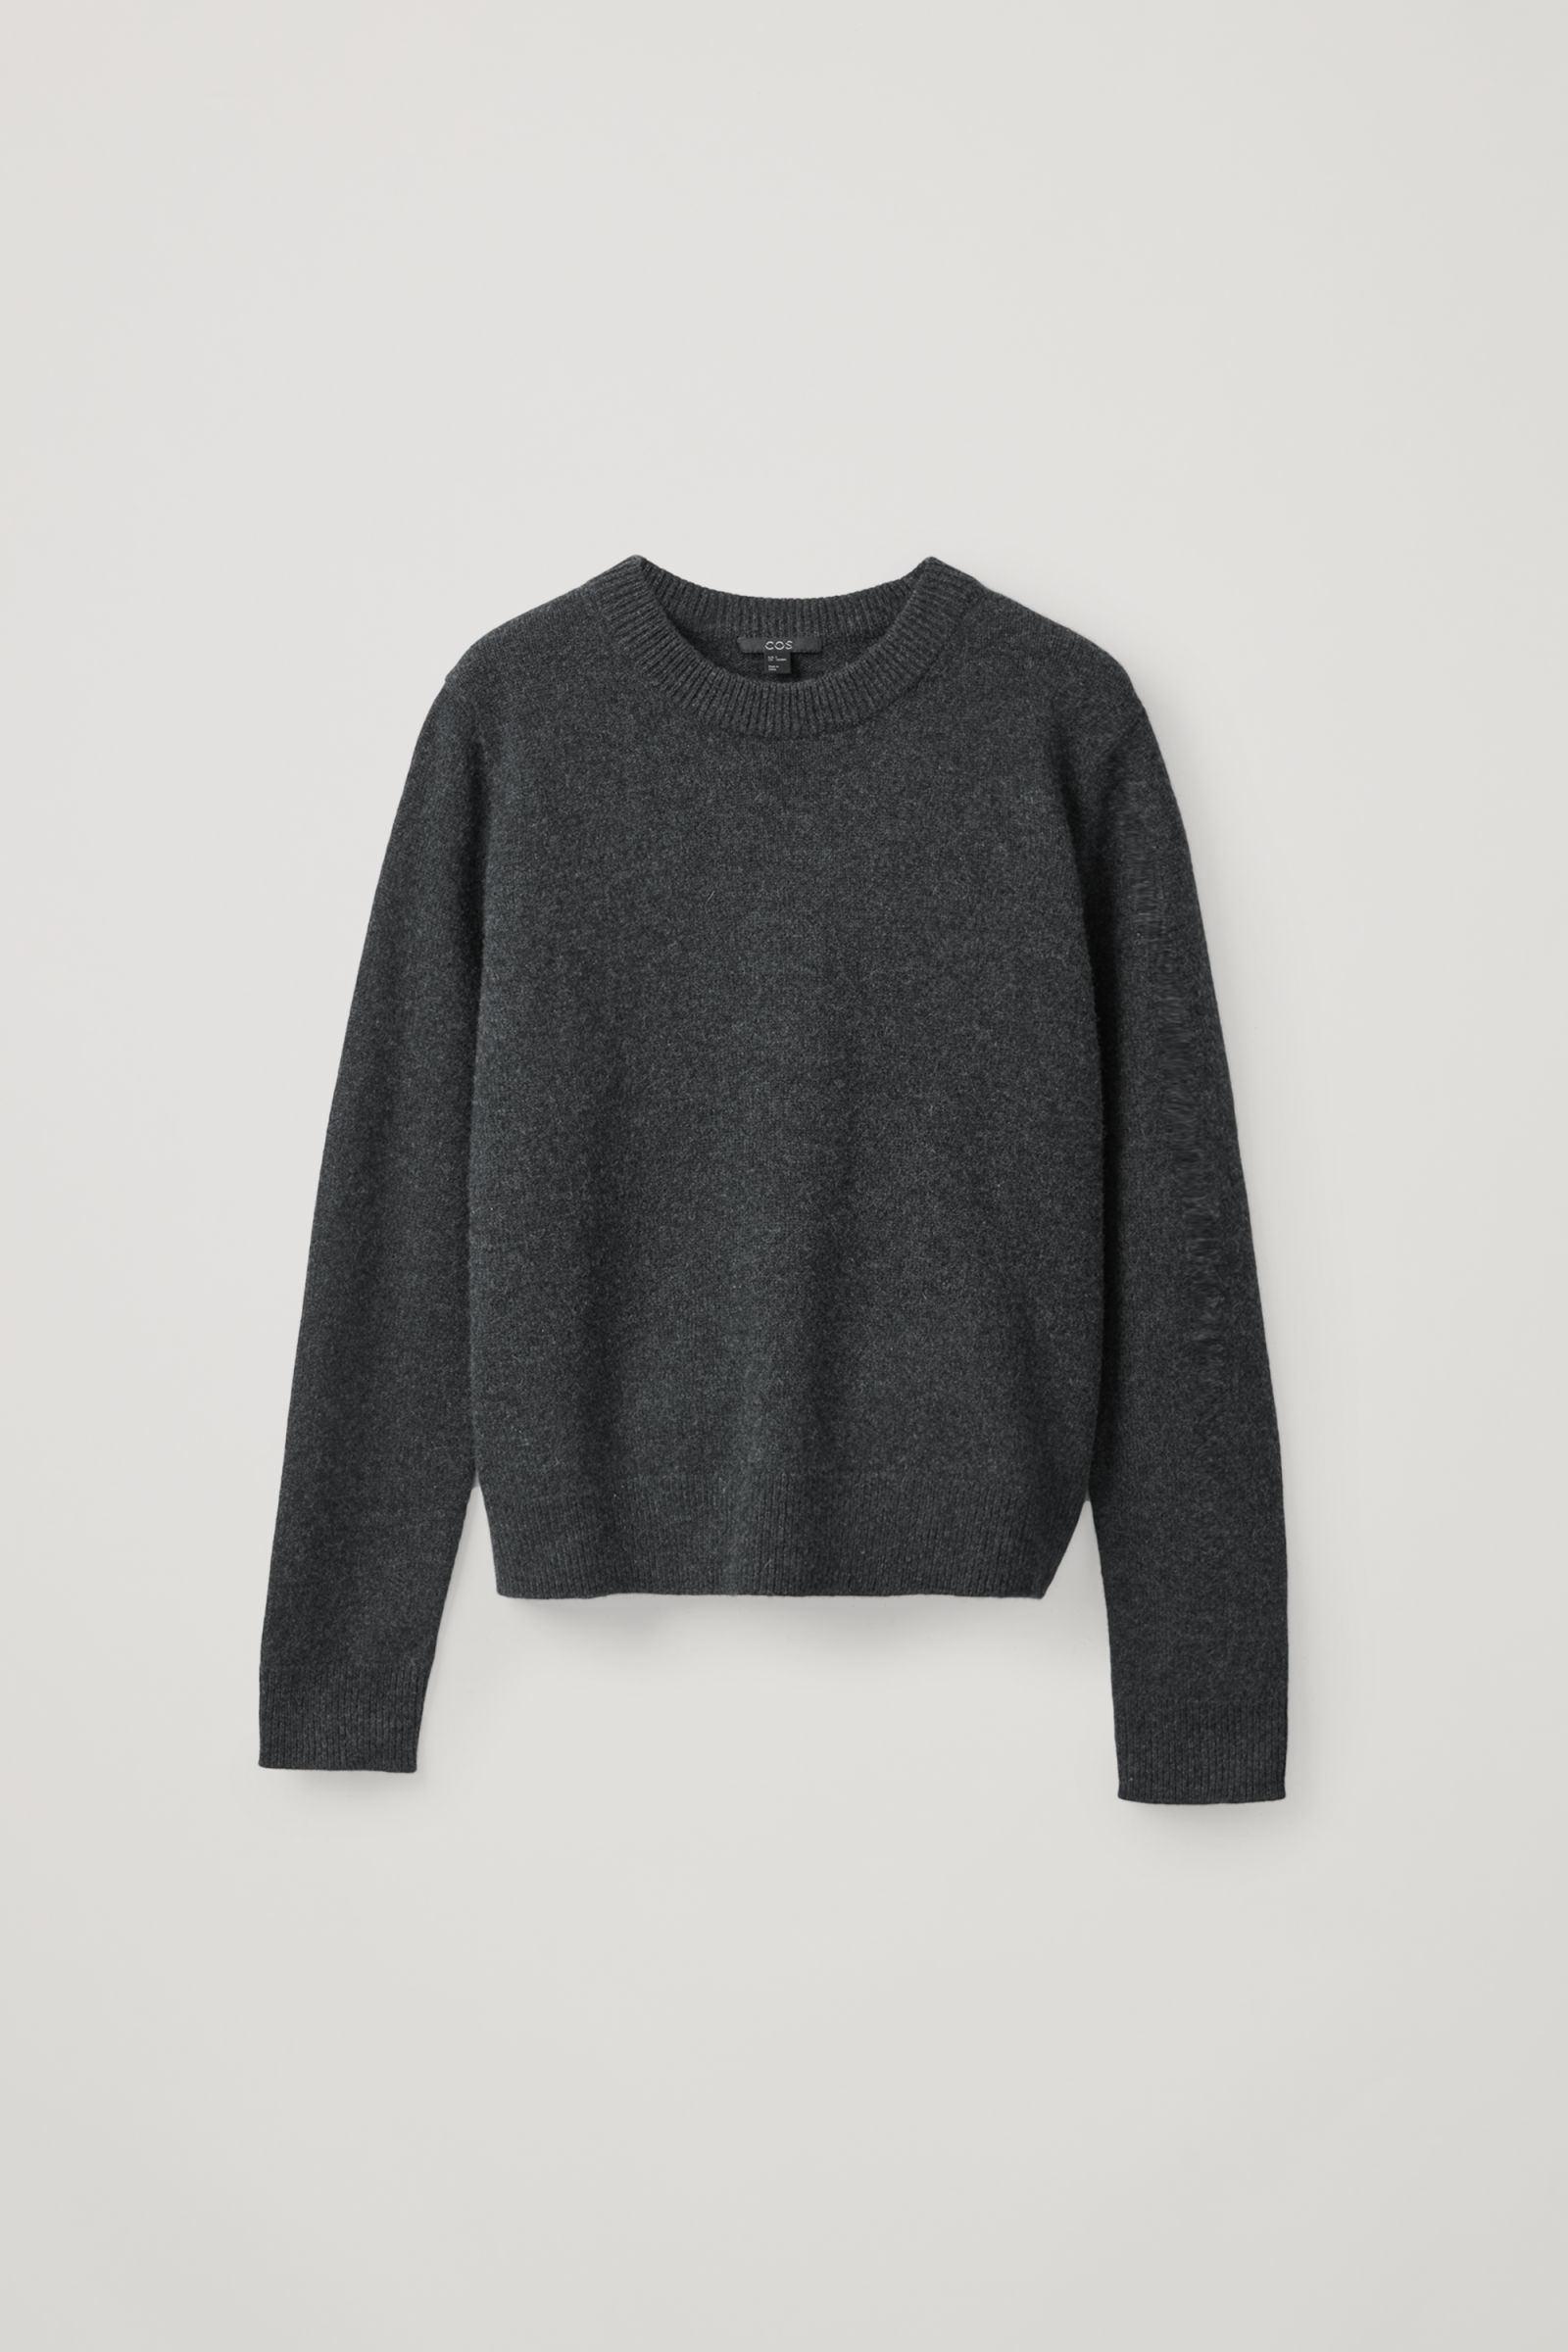 COS 니티드 캐시미어 스웨터의 차콜컬러 Product입니다.